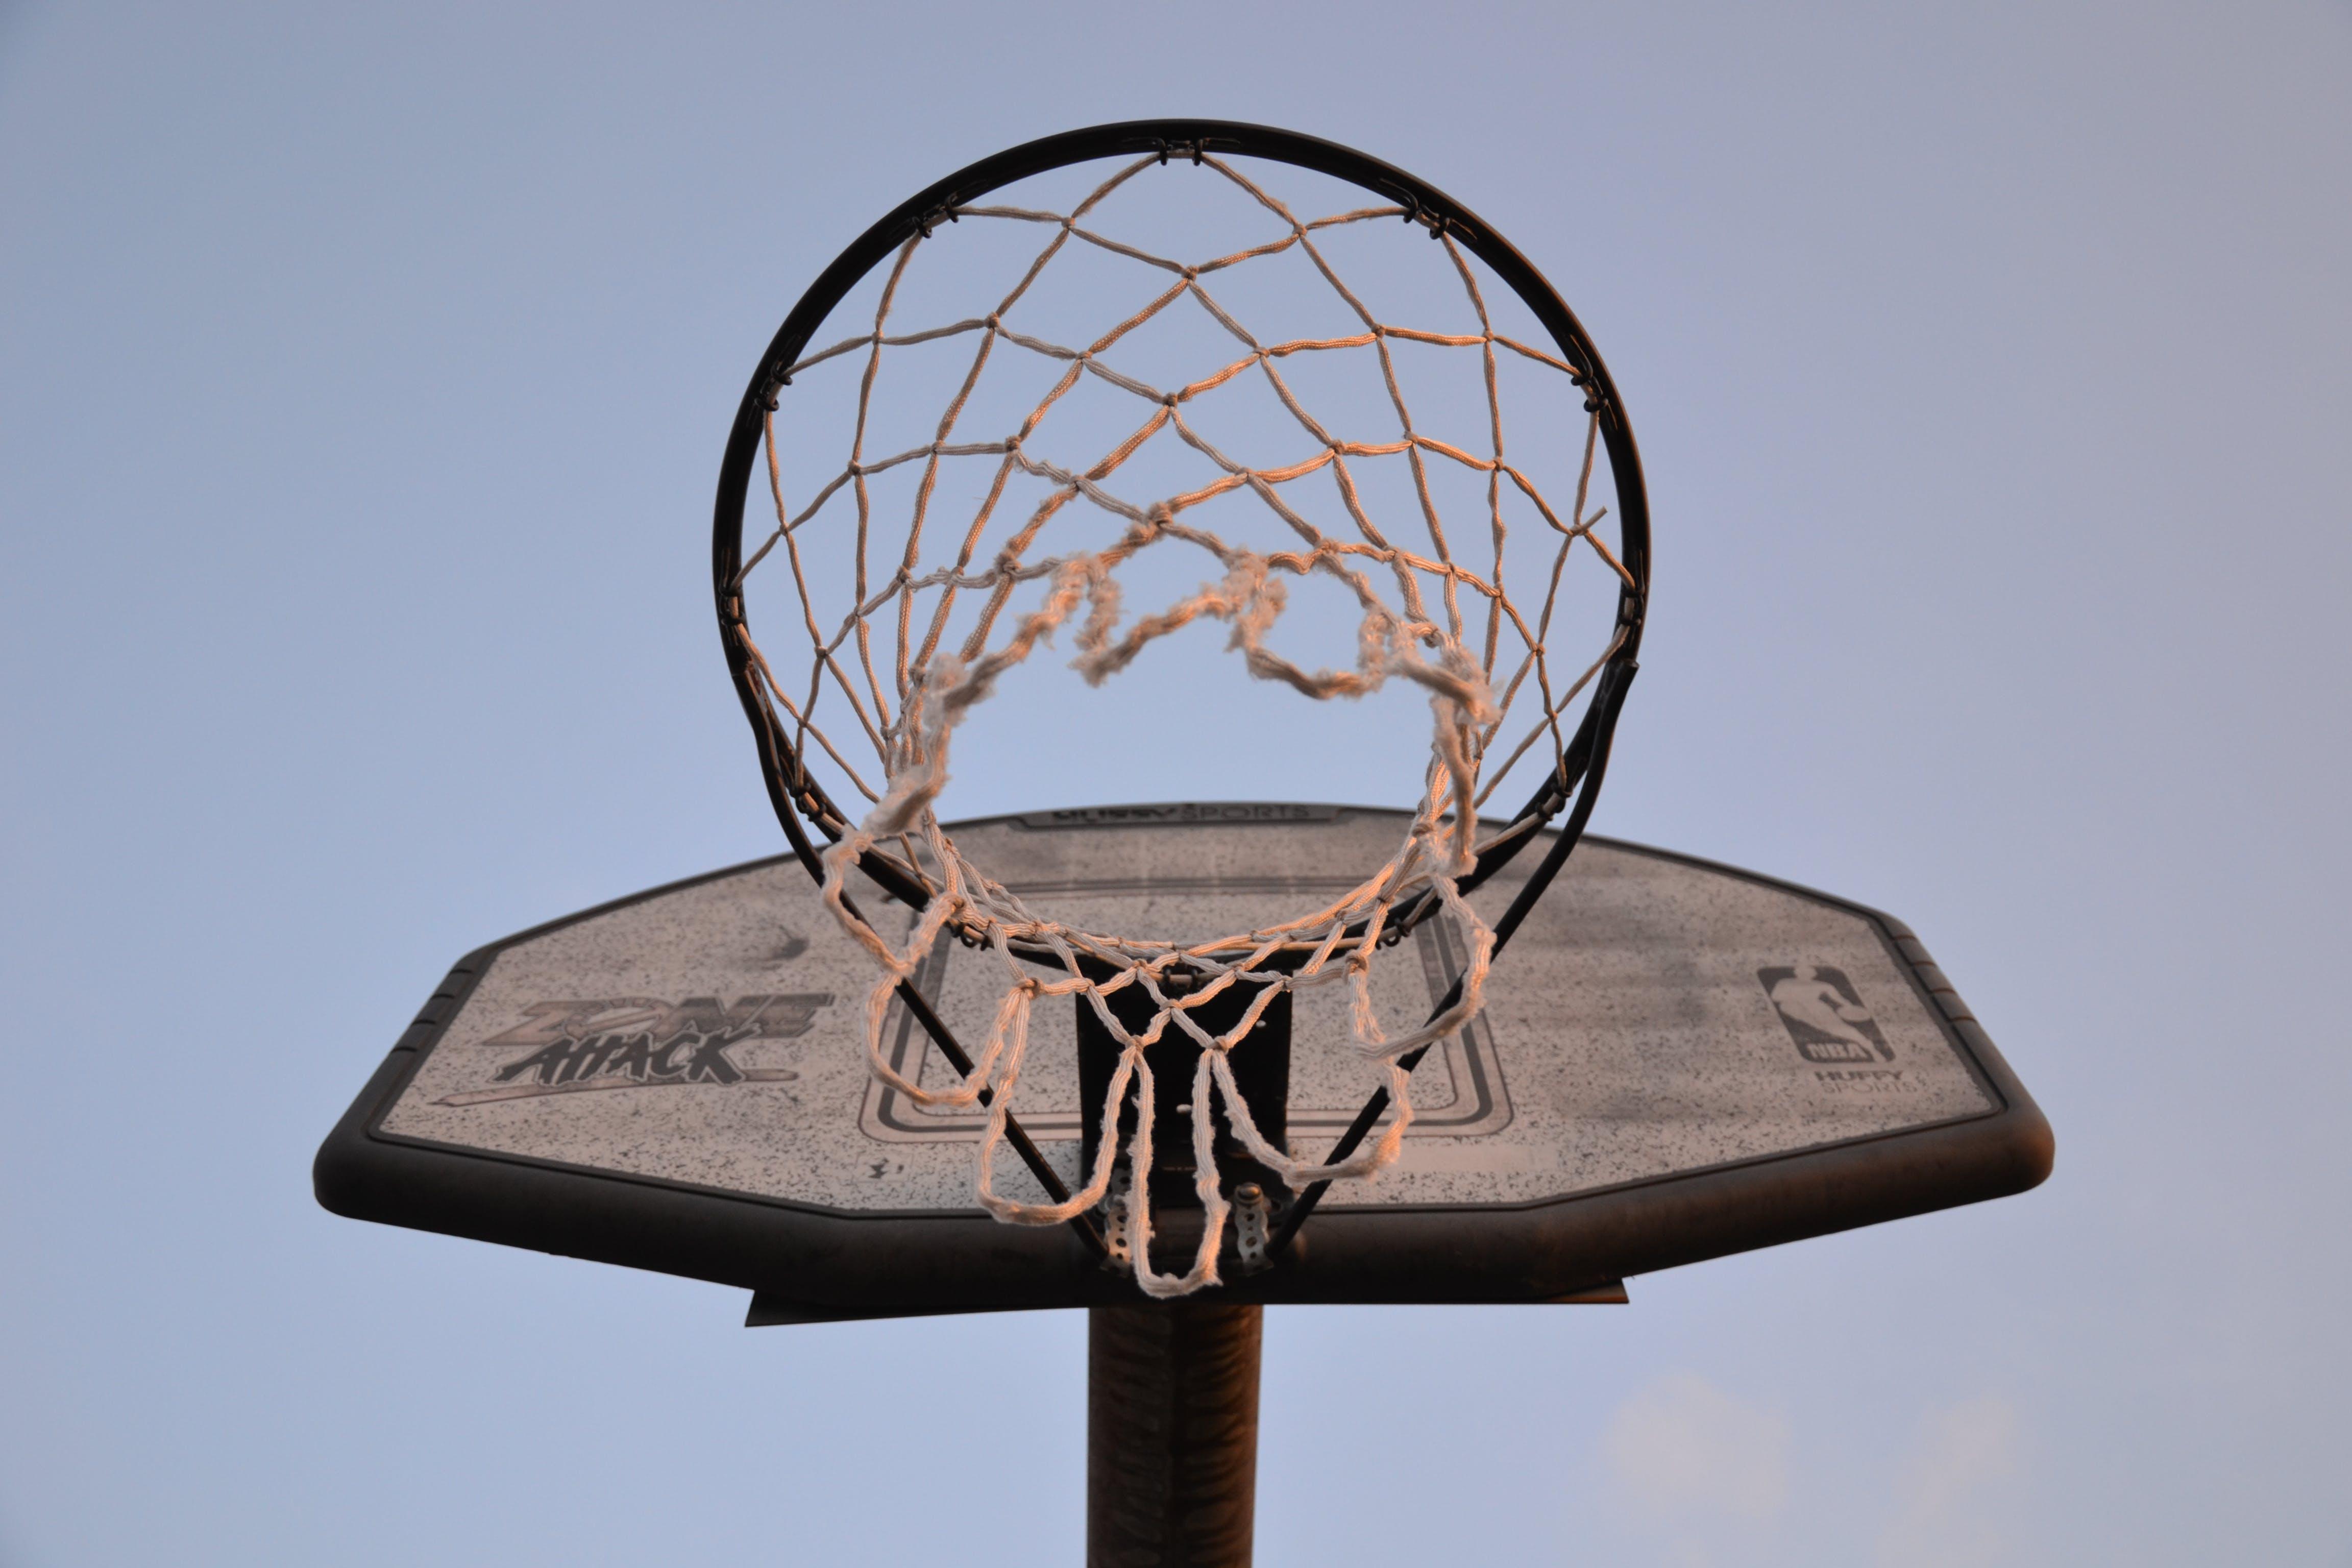 Low-angle Photography of Brown and Black Basketball Hoop